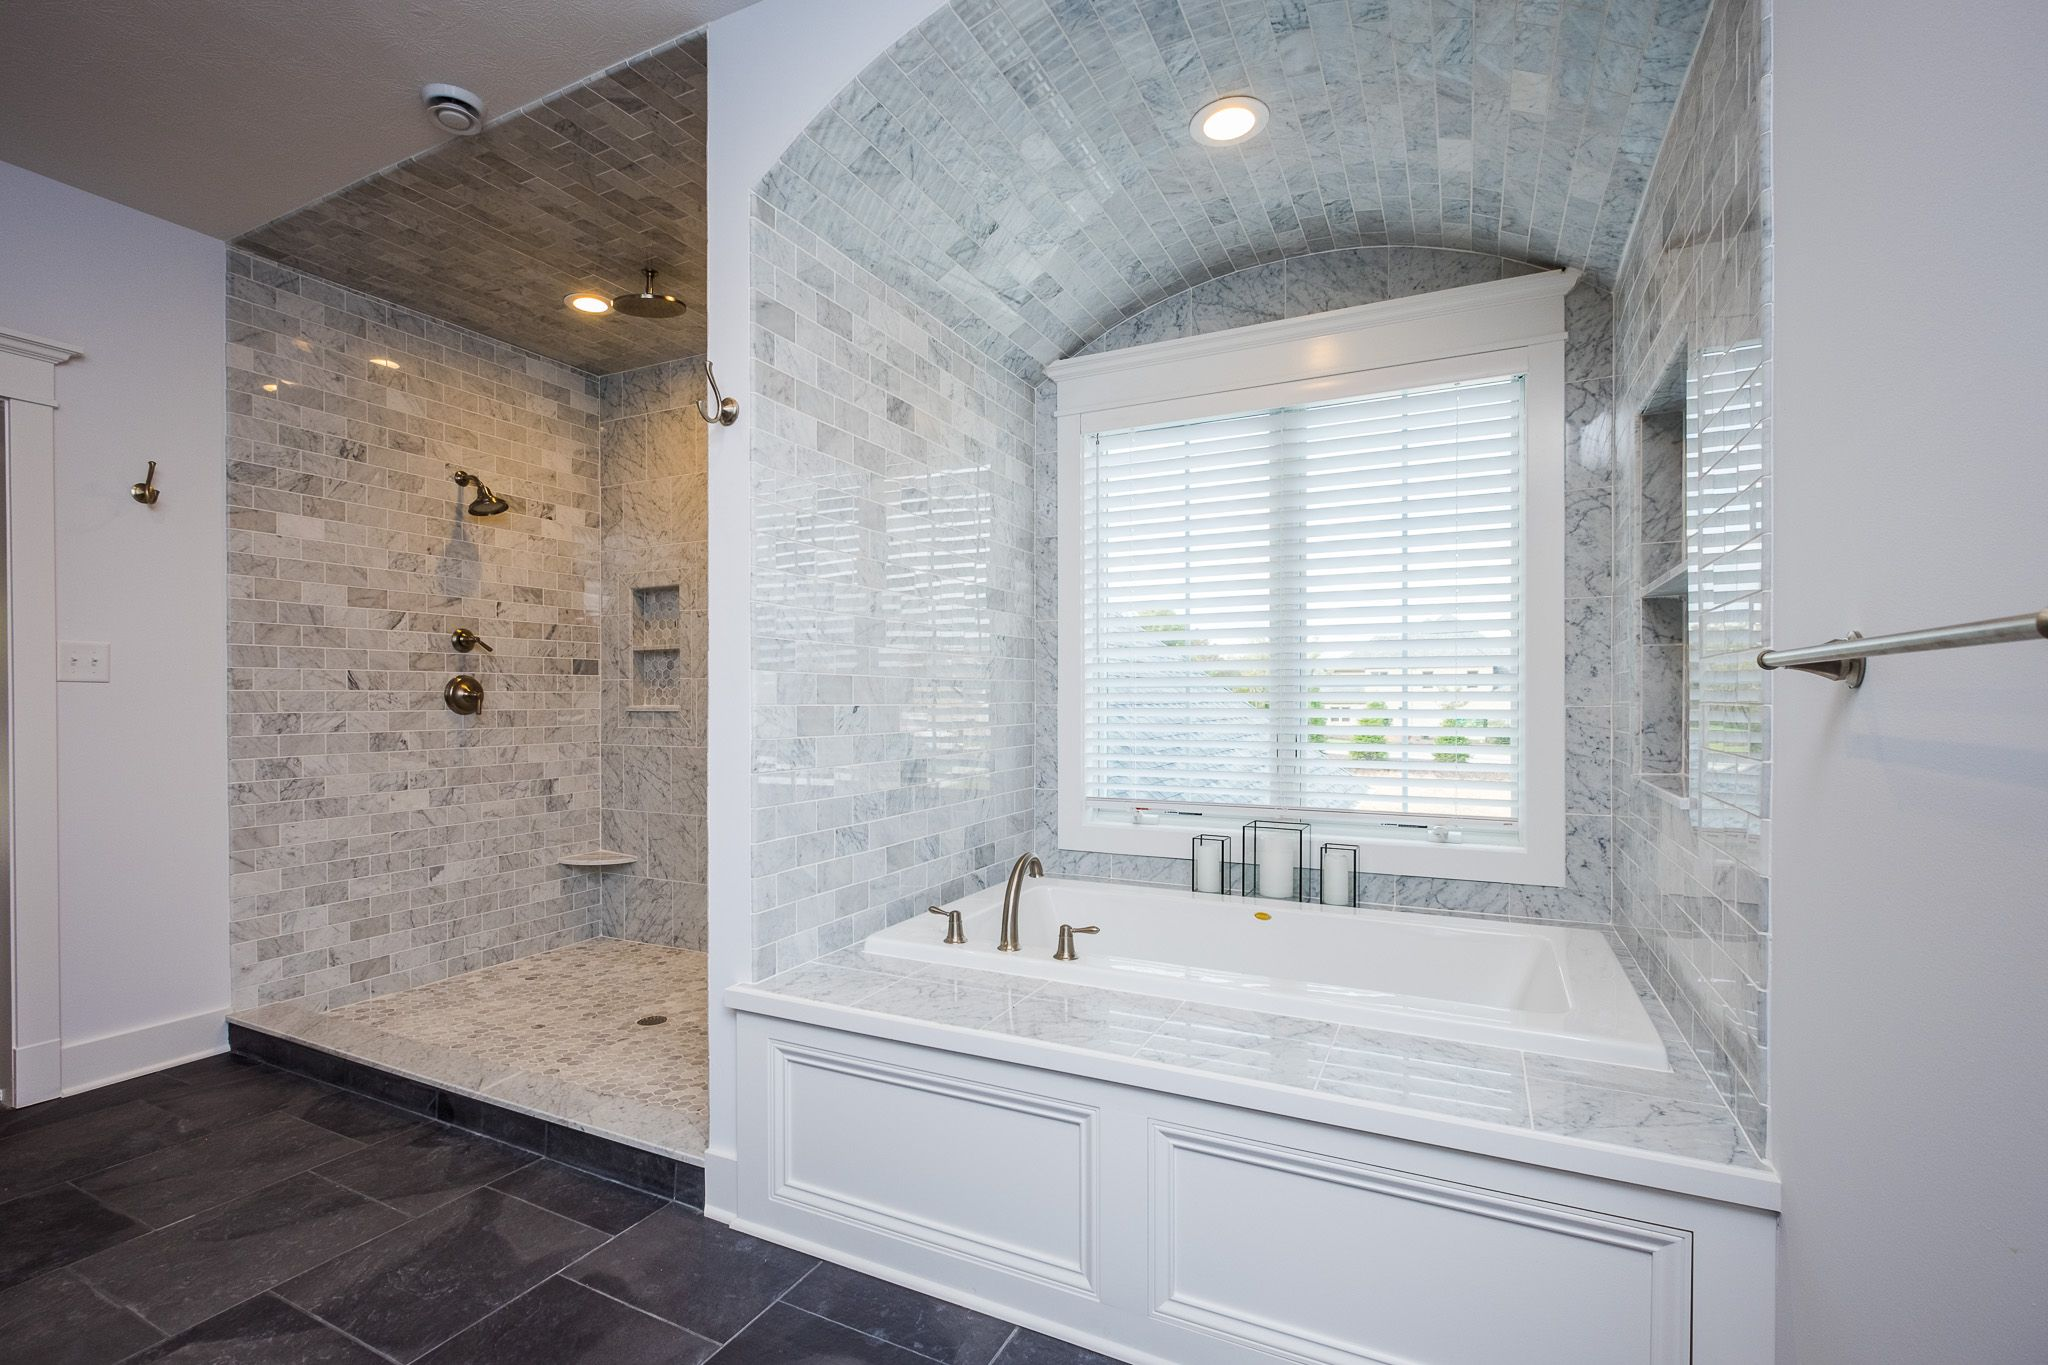 Exelent Tile Work In Bathrooms Collection - Bathroom Design Ideas ...